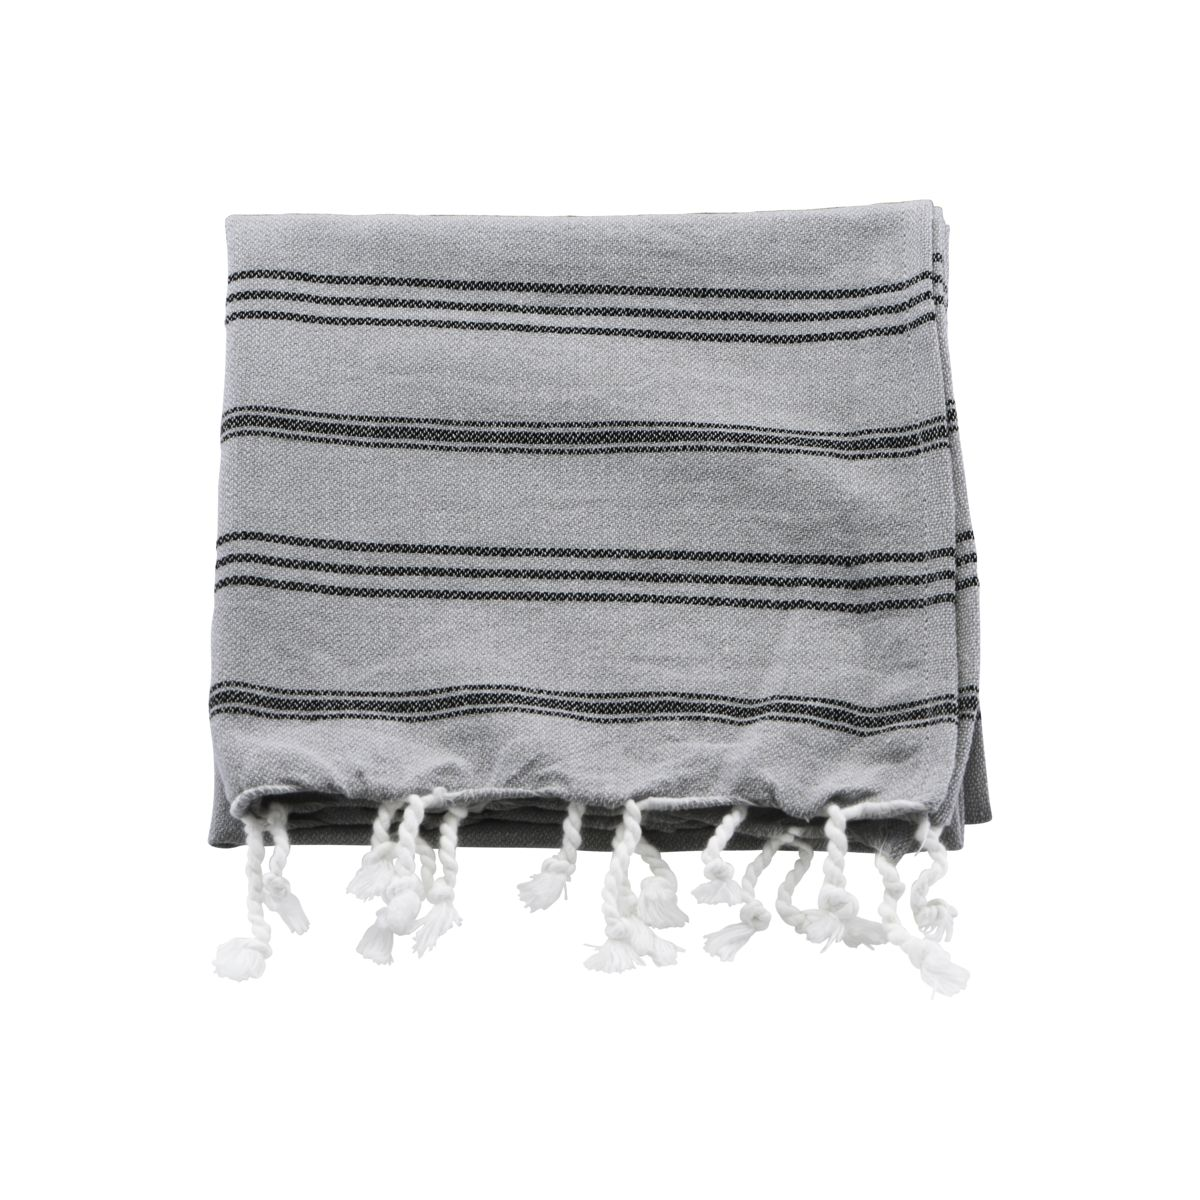 Image of   Meraki Hammam håndklæde, Grå m. sort stribe, l: 90 cm, b: 45 cm